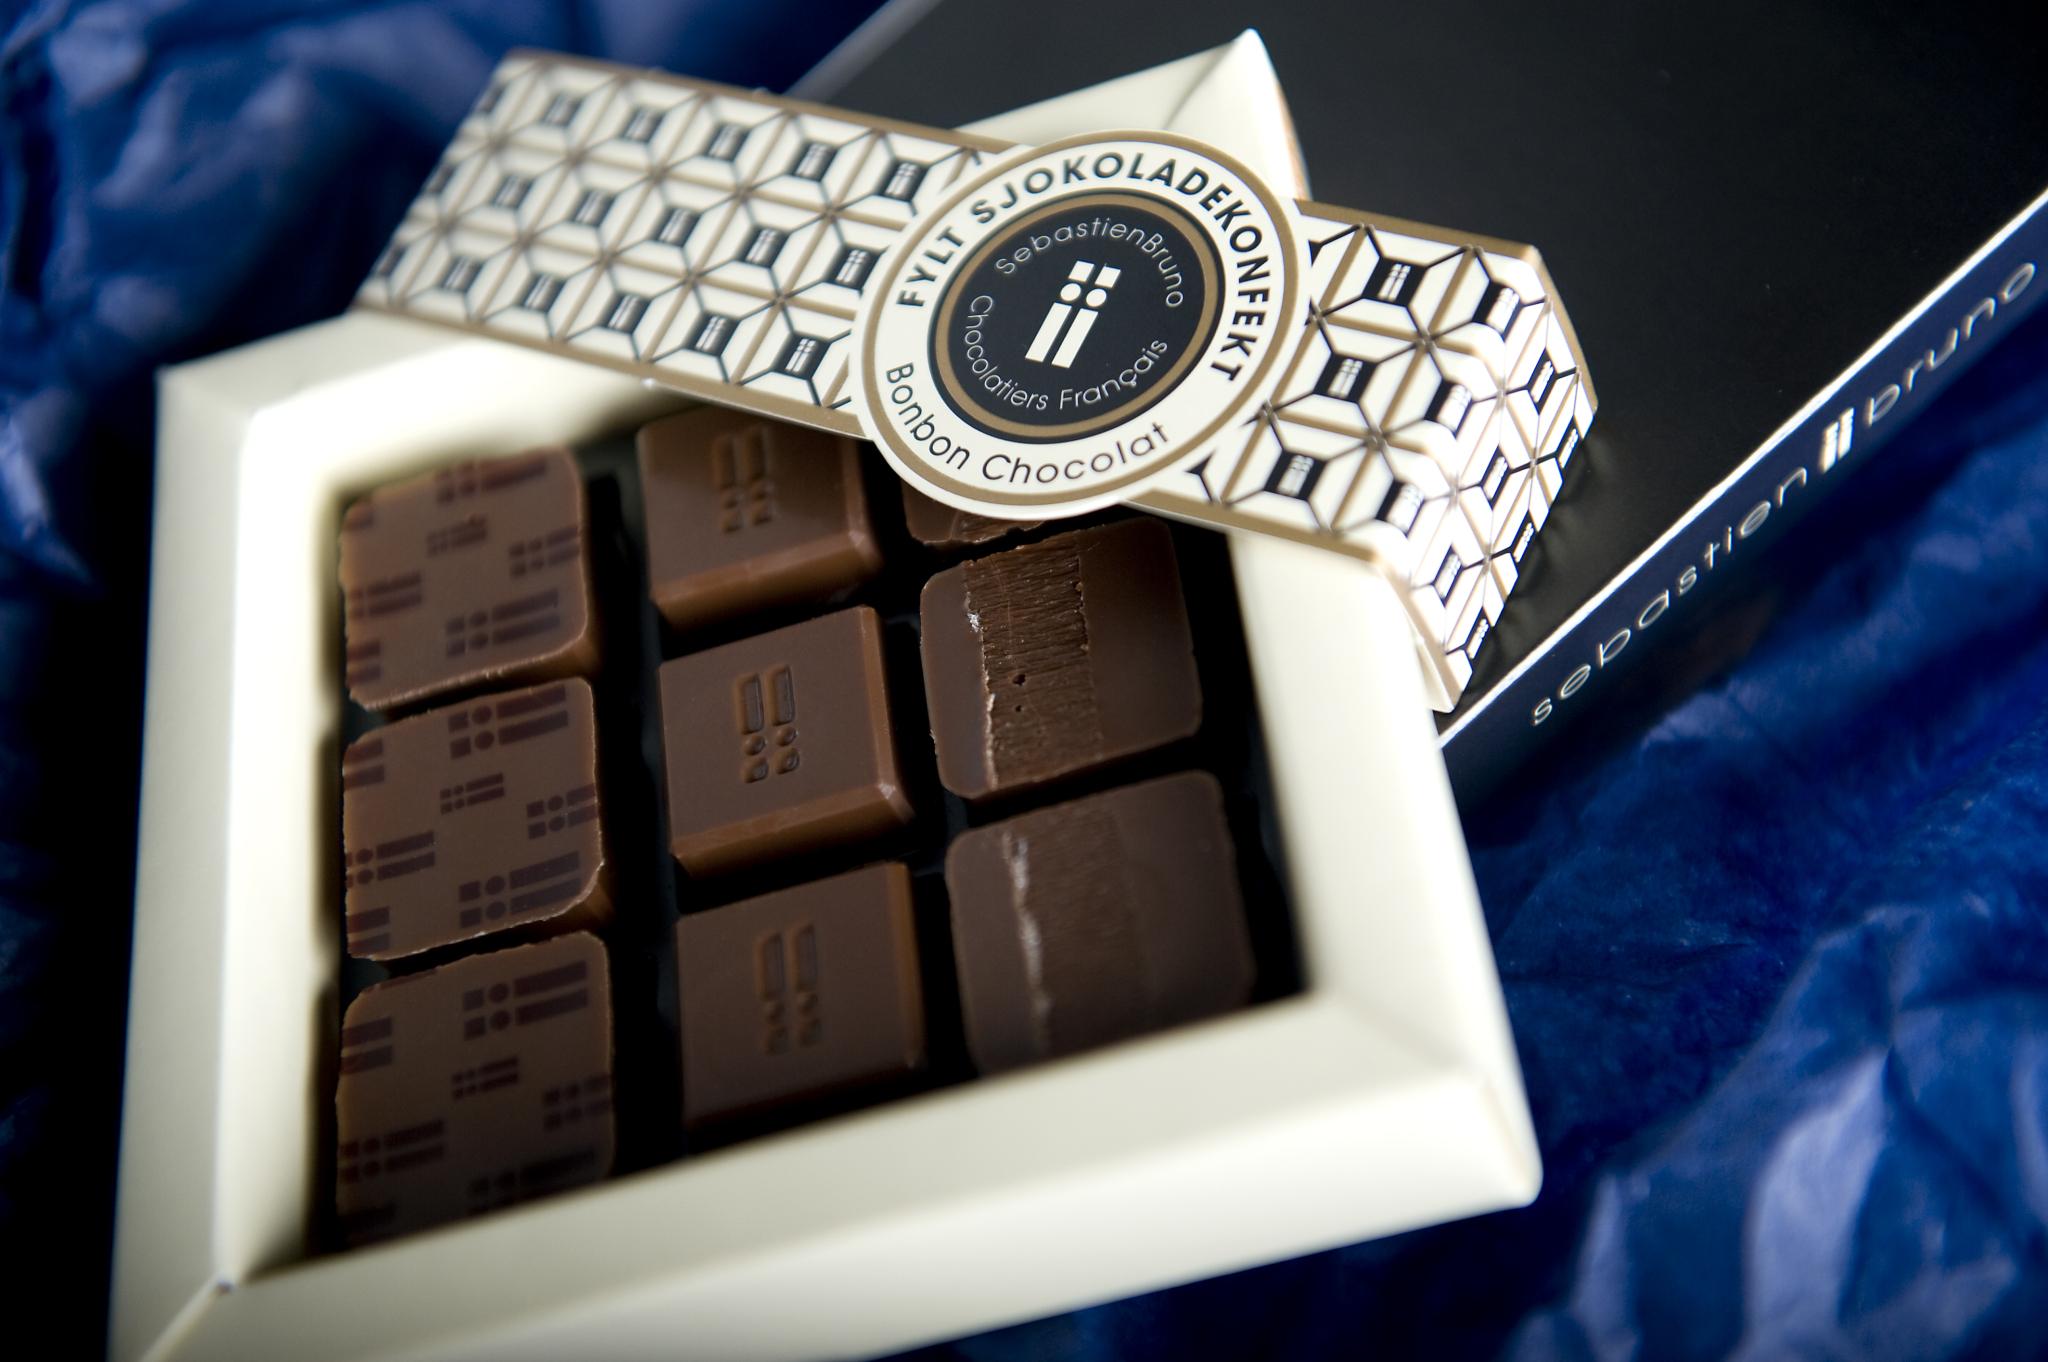 Produkt – Sjokolade